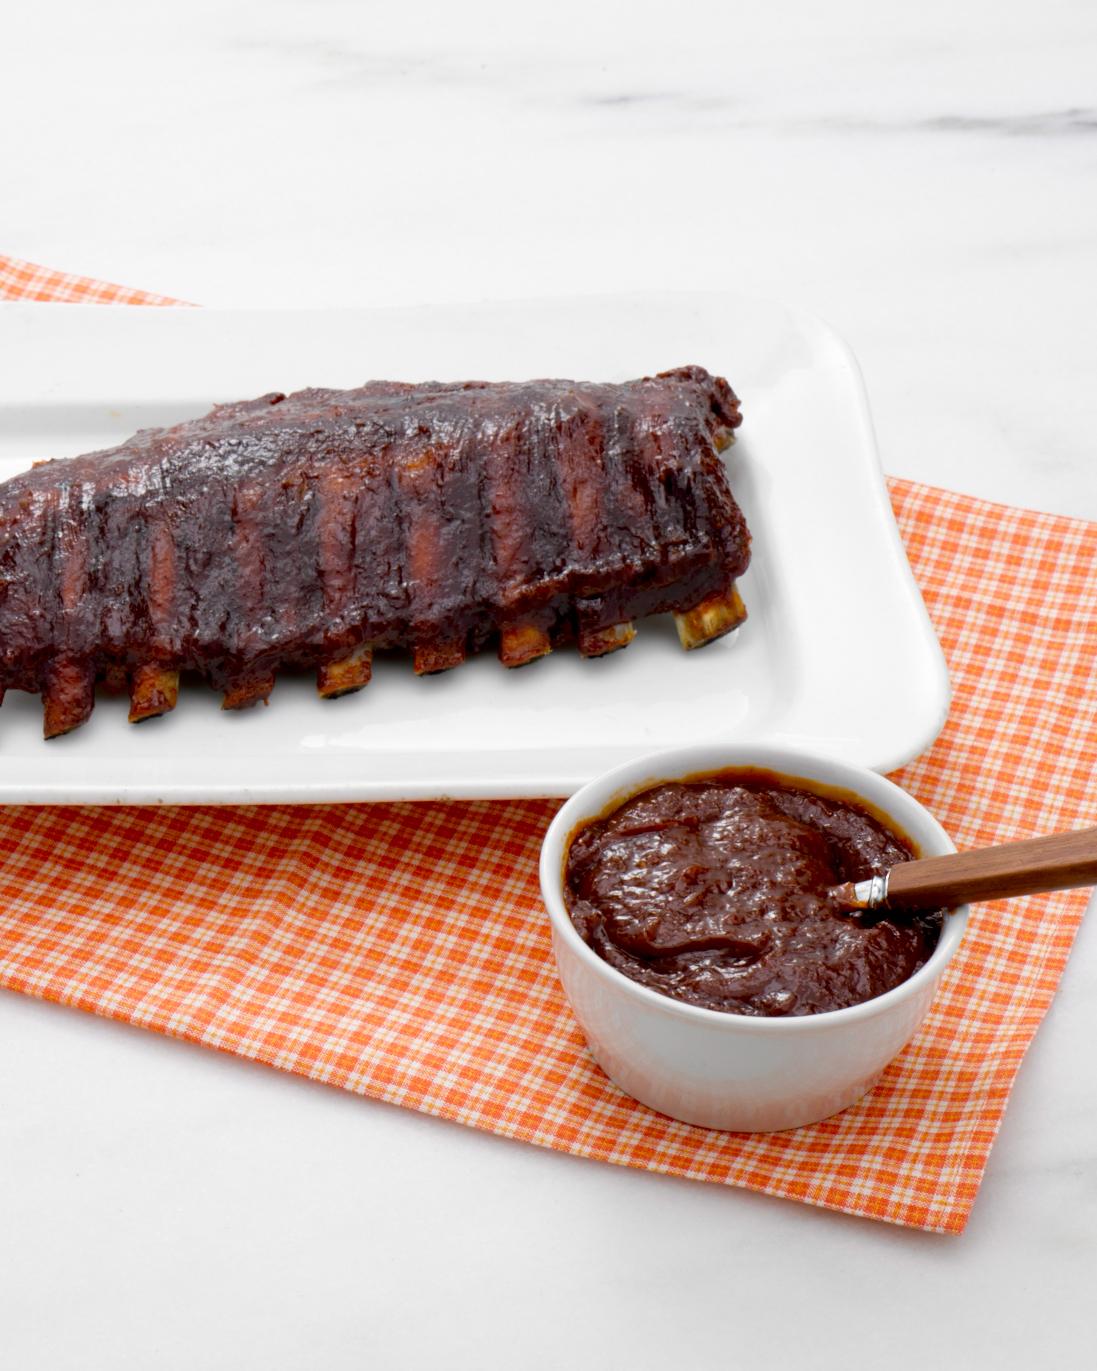 martha-stewart-cooking-school-barbecue-sauce-am-605-d110633-20130923.jpg